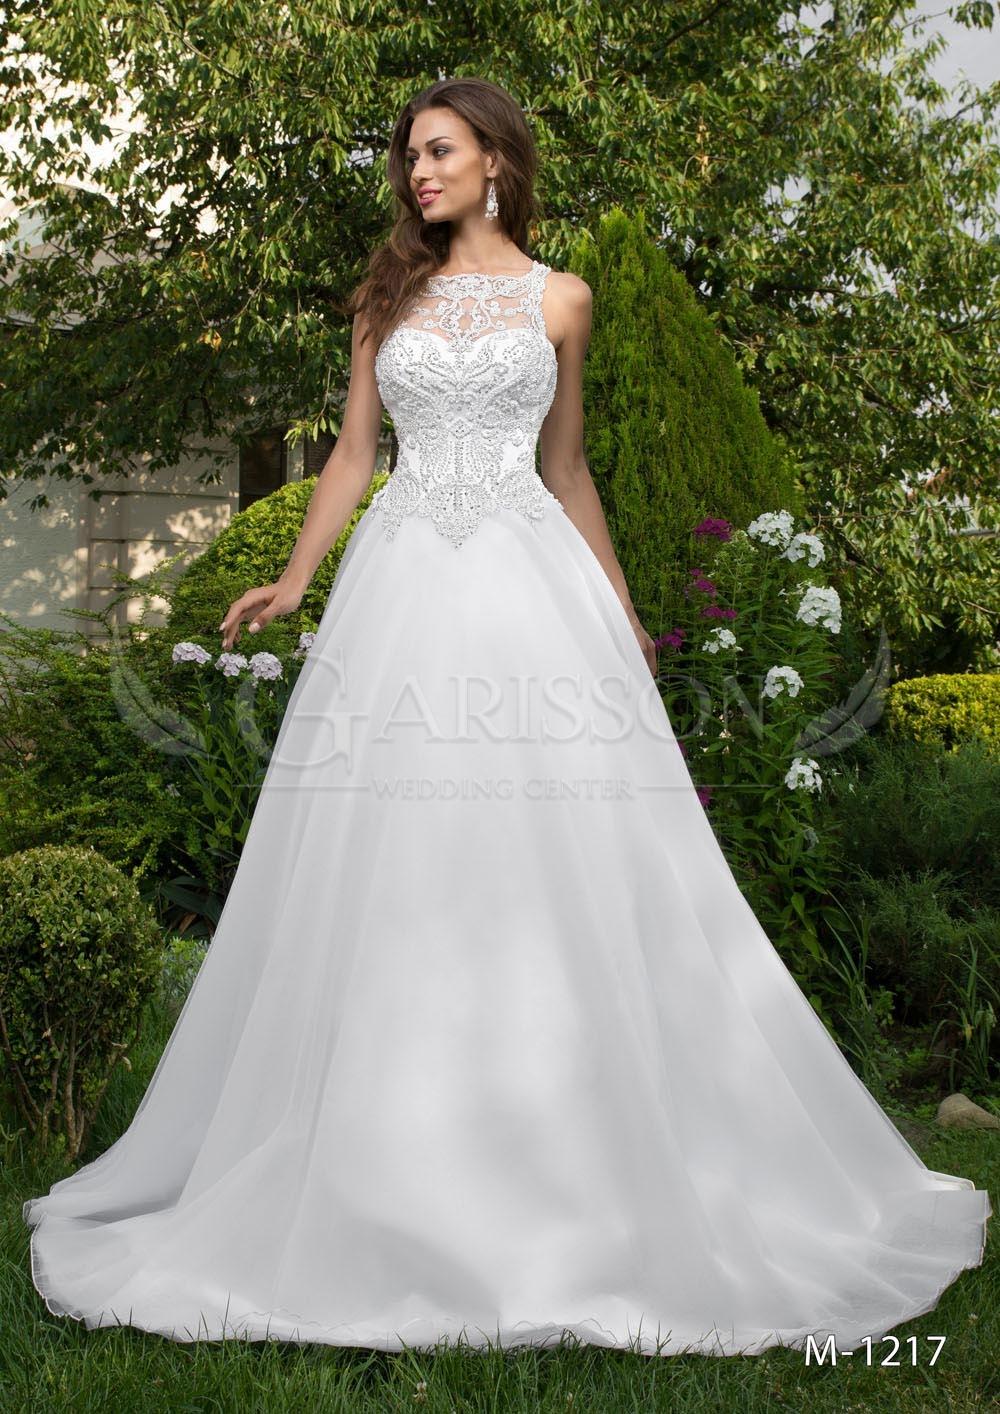 Svadobné šaty M1217 - Garisson 039c327c409